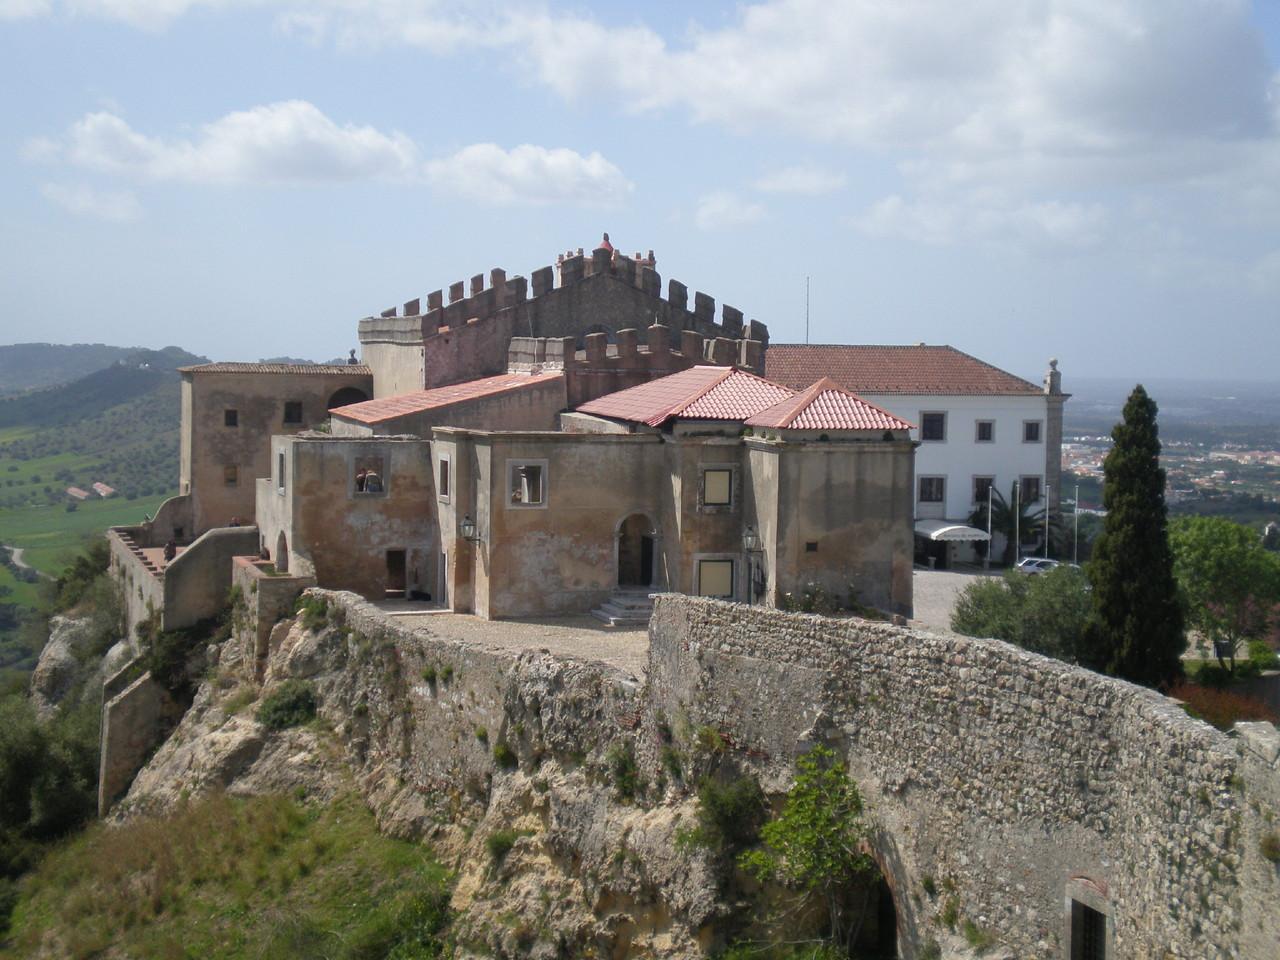 Castelo_e_Pousada_de_Palmela.jpg